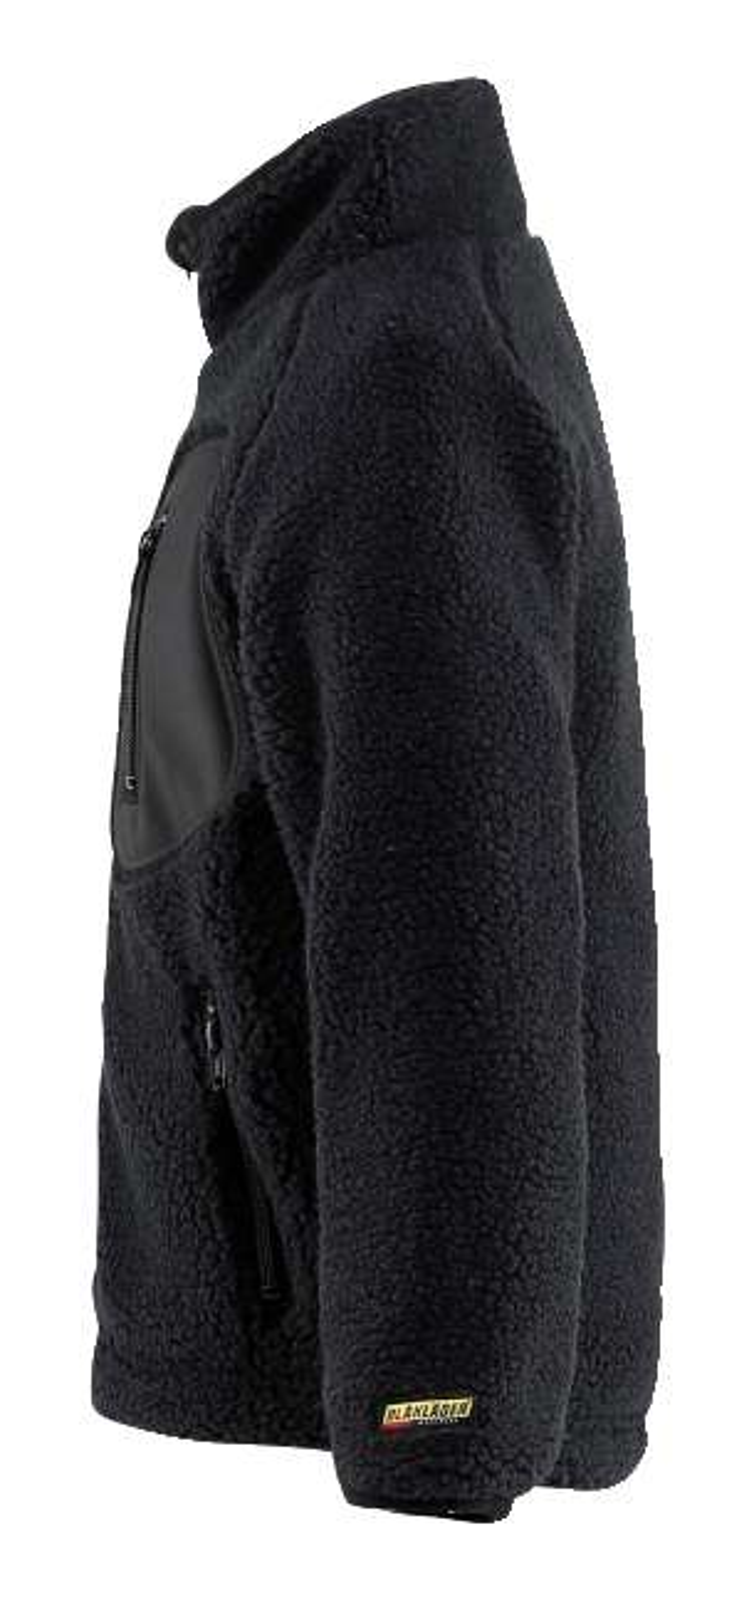 Blaklader Vesten 48792505 zwart(9900)